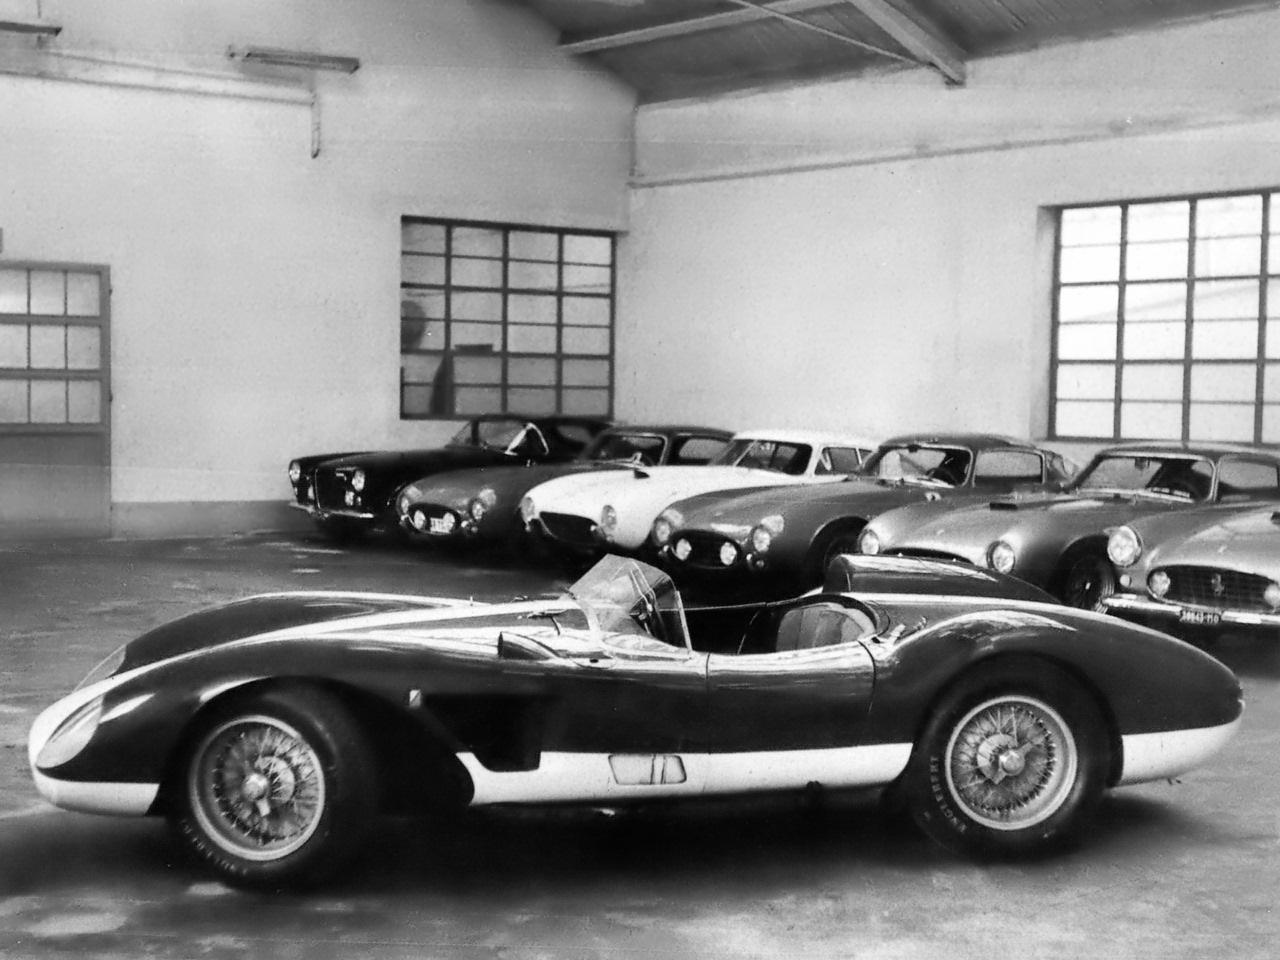 1955 dodge royal lancer convertible cream black fvr cars - 41 1955 Ferrari 375 America One Off Built For Fiat Chief Gianni Agnelli Bw